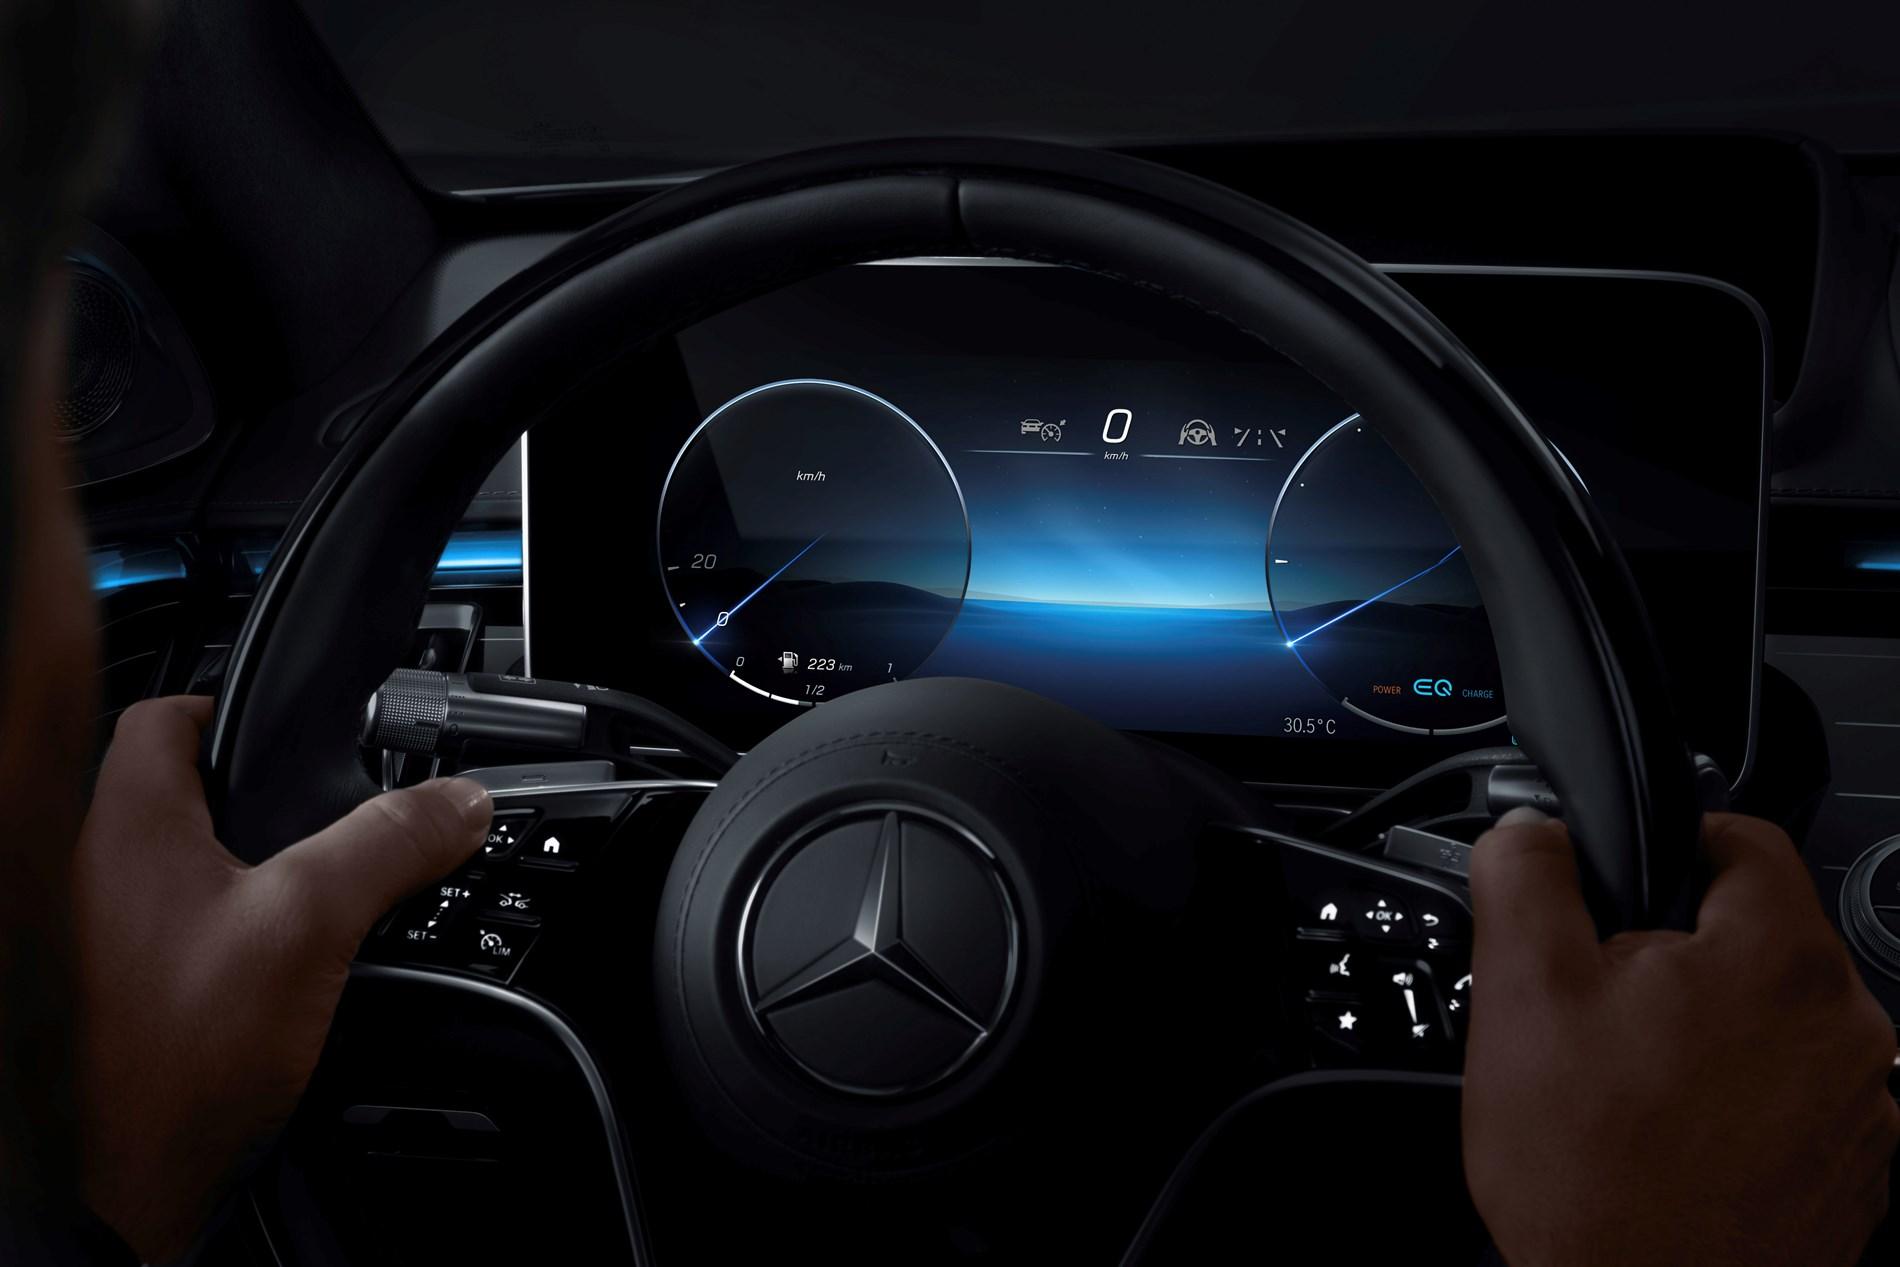 Car Avenue Meet the S-Class DIGITAL : « My MBUX » (Mercedes-Benz User Experience)